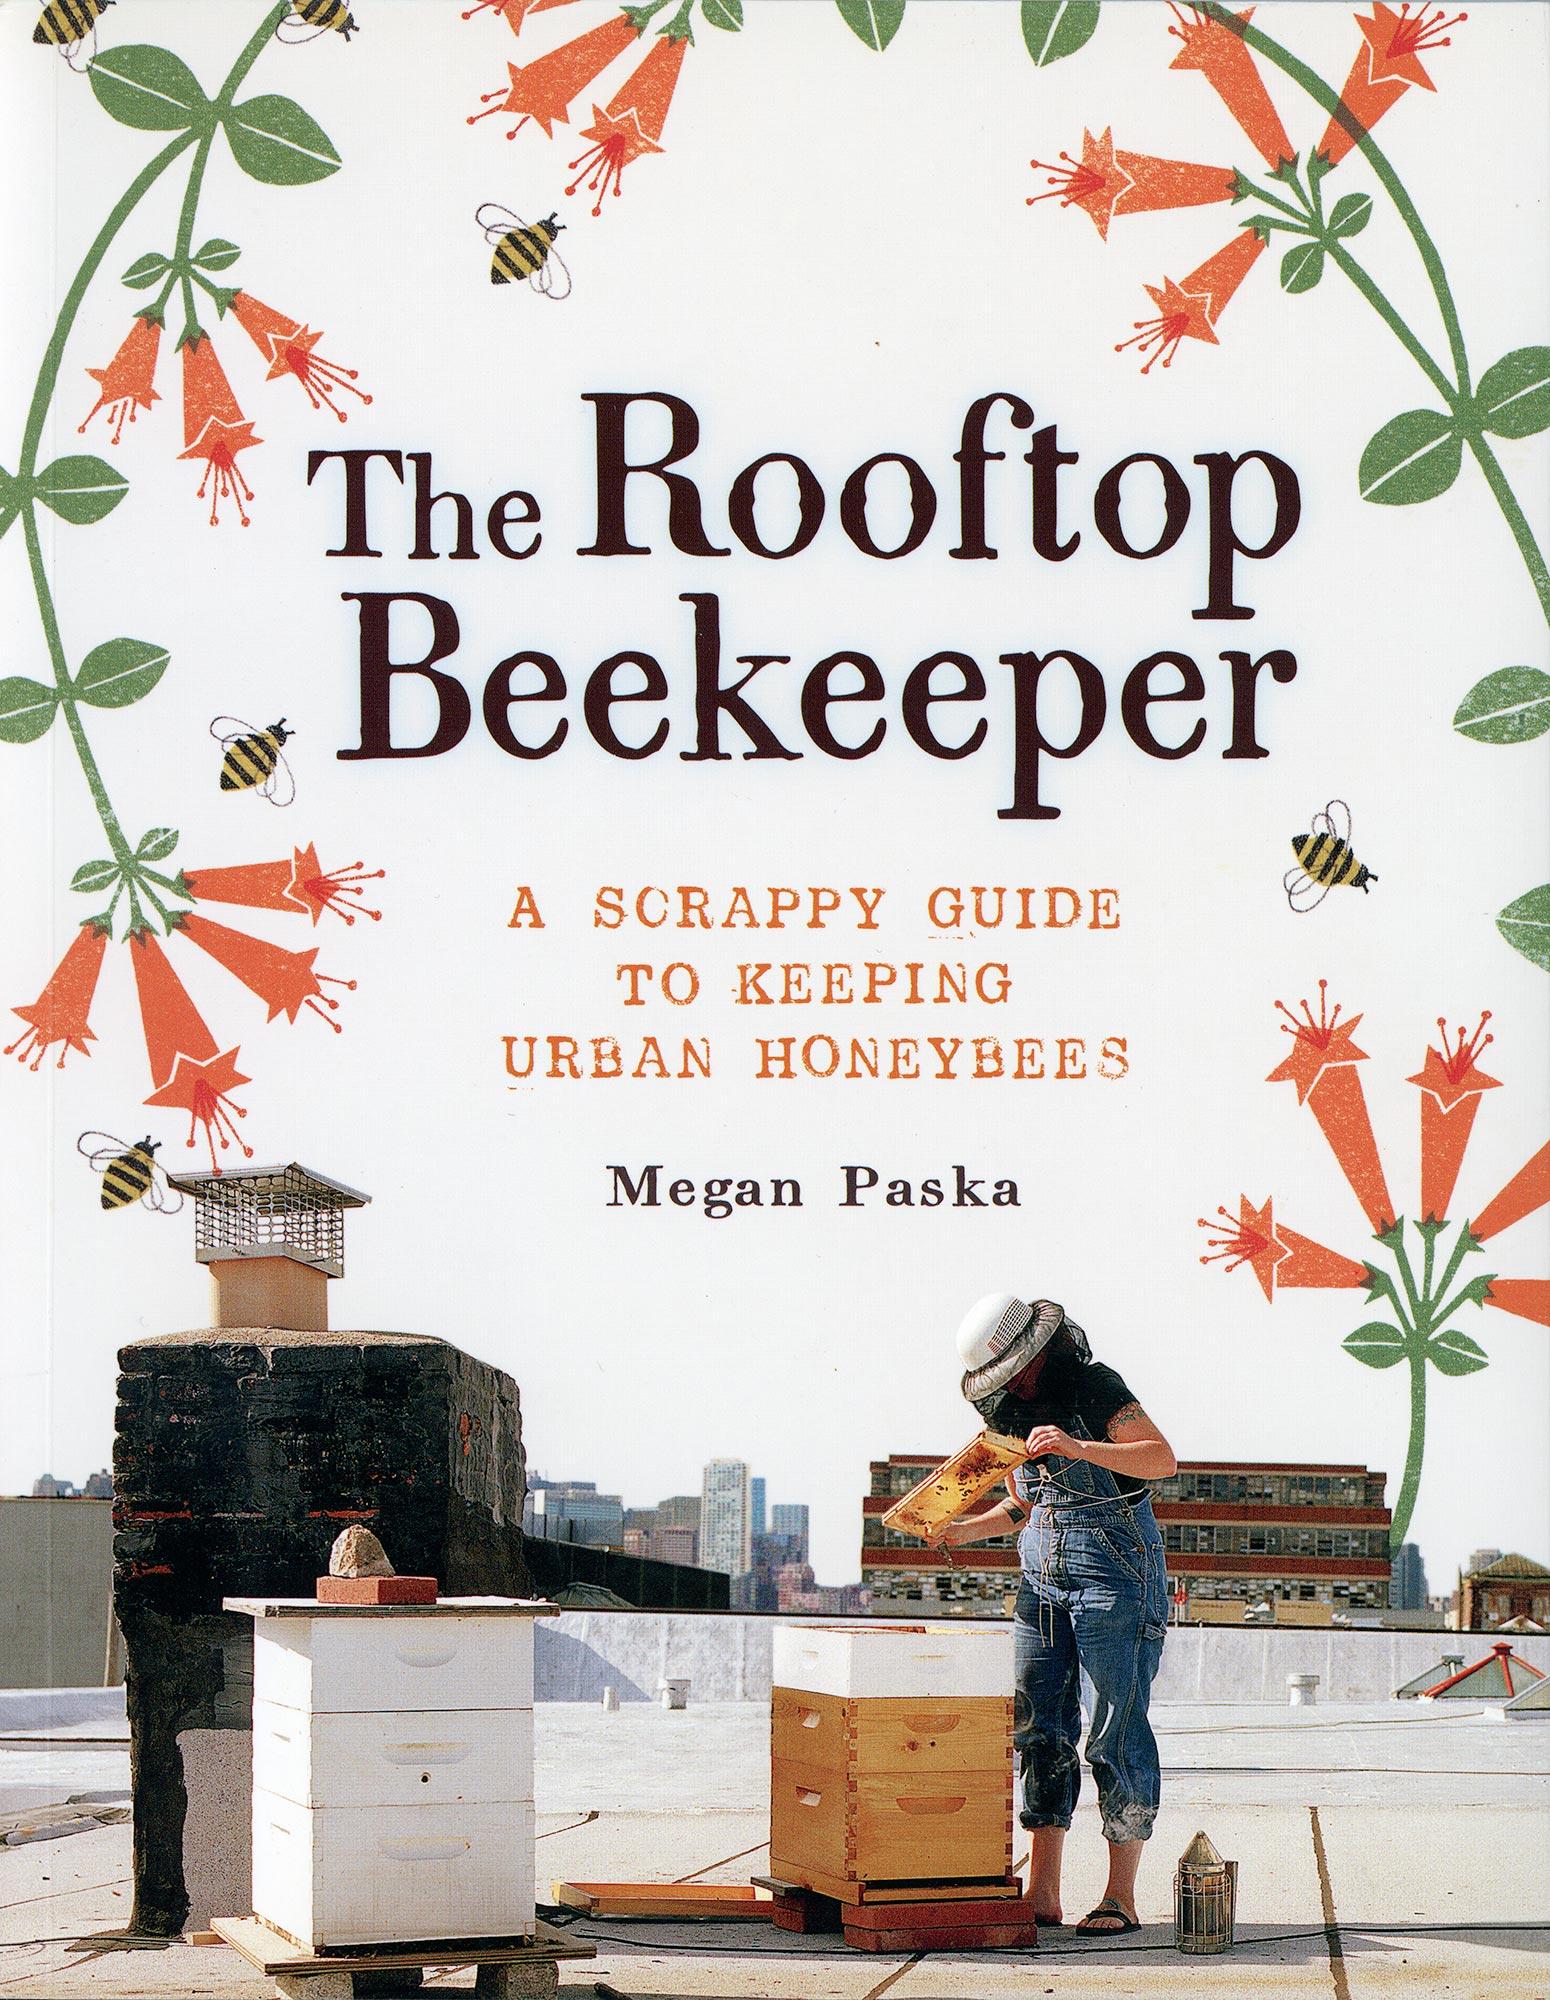 'The Rooftop Beekeeper'